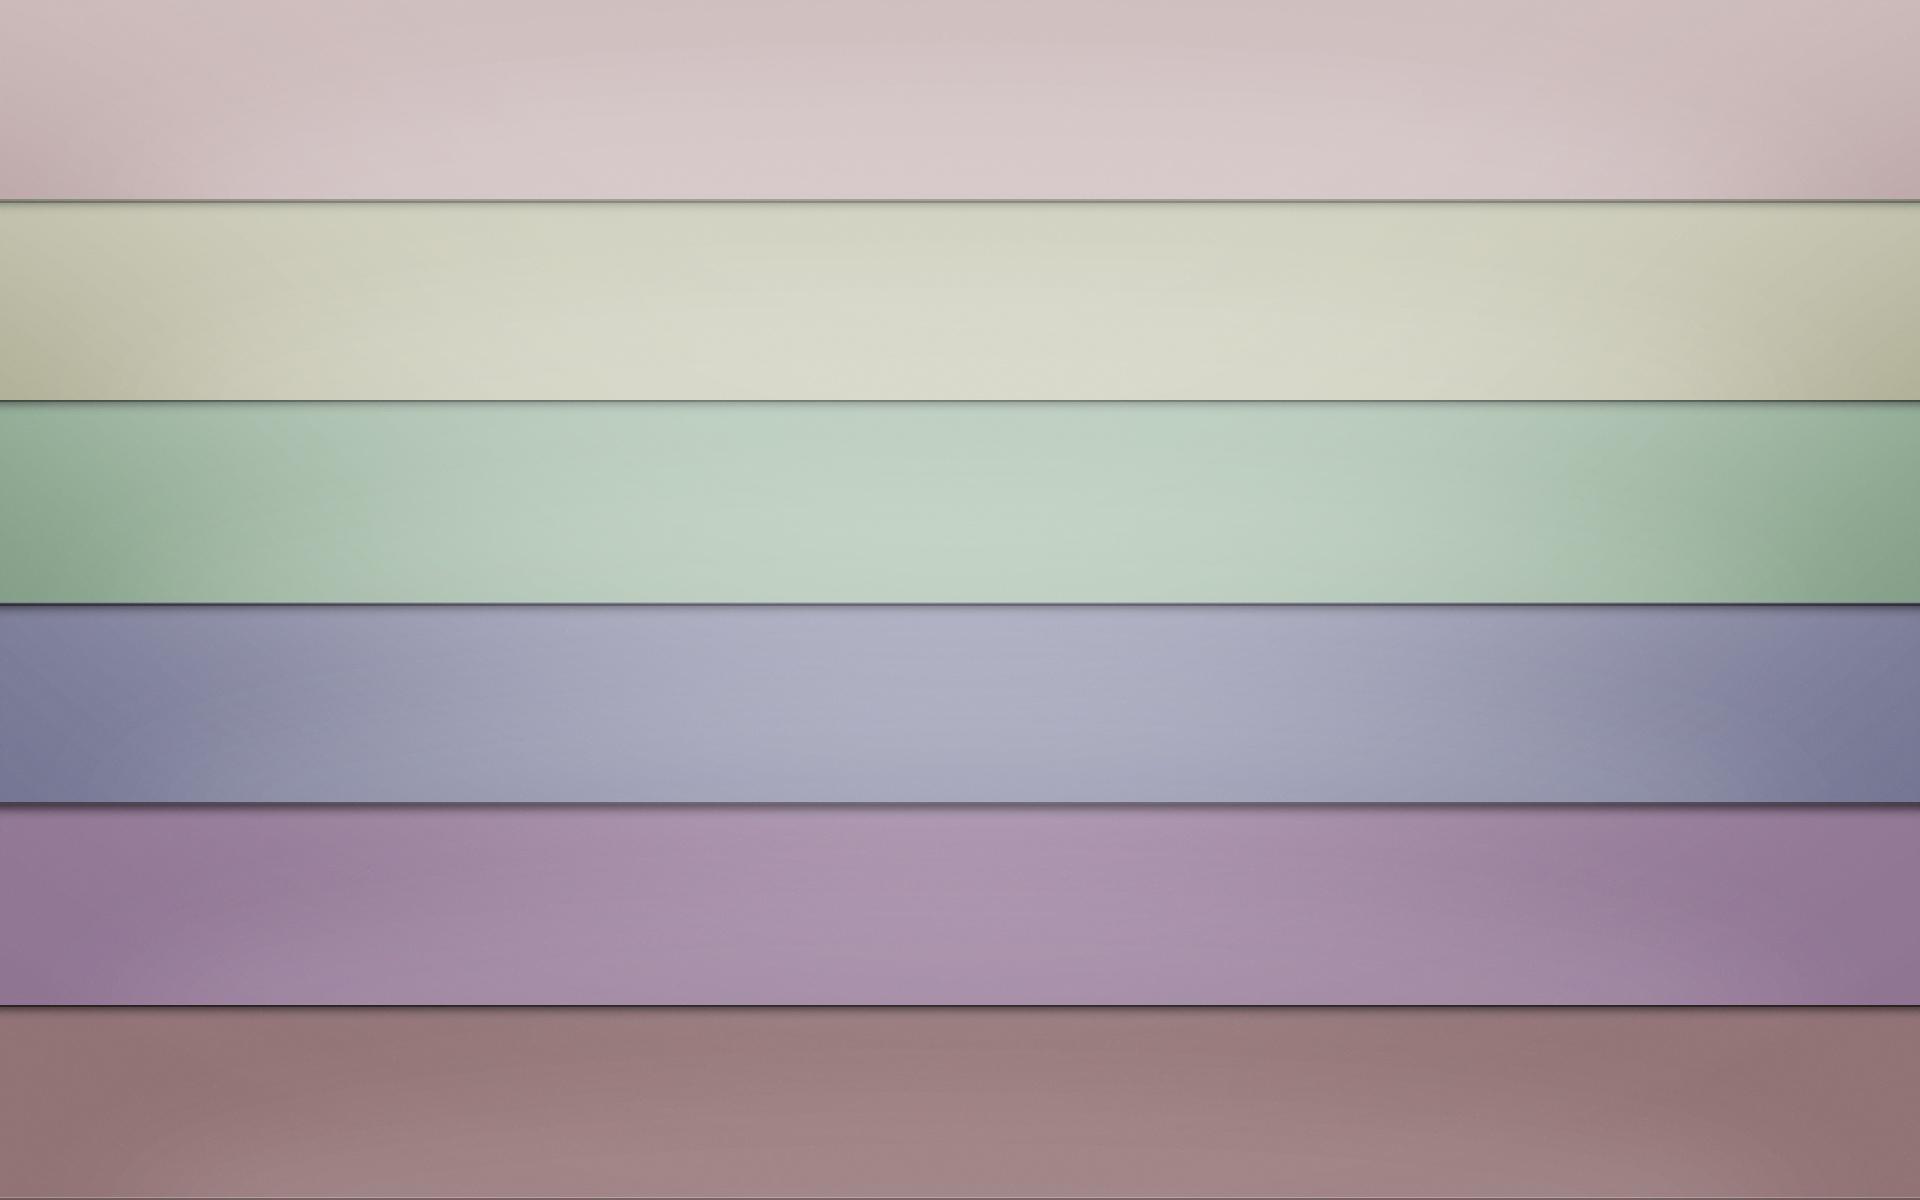 Pastel wallpaper   90909 1920x1200